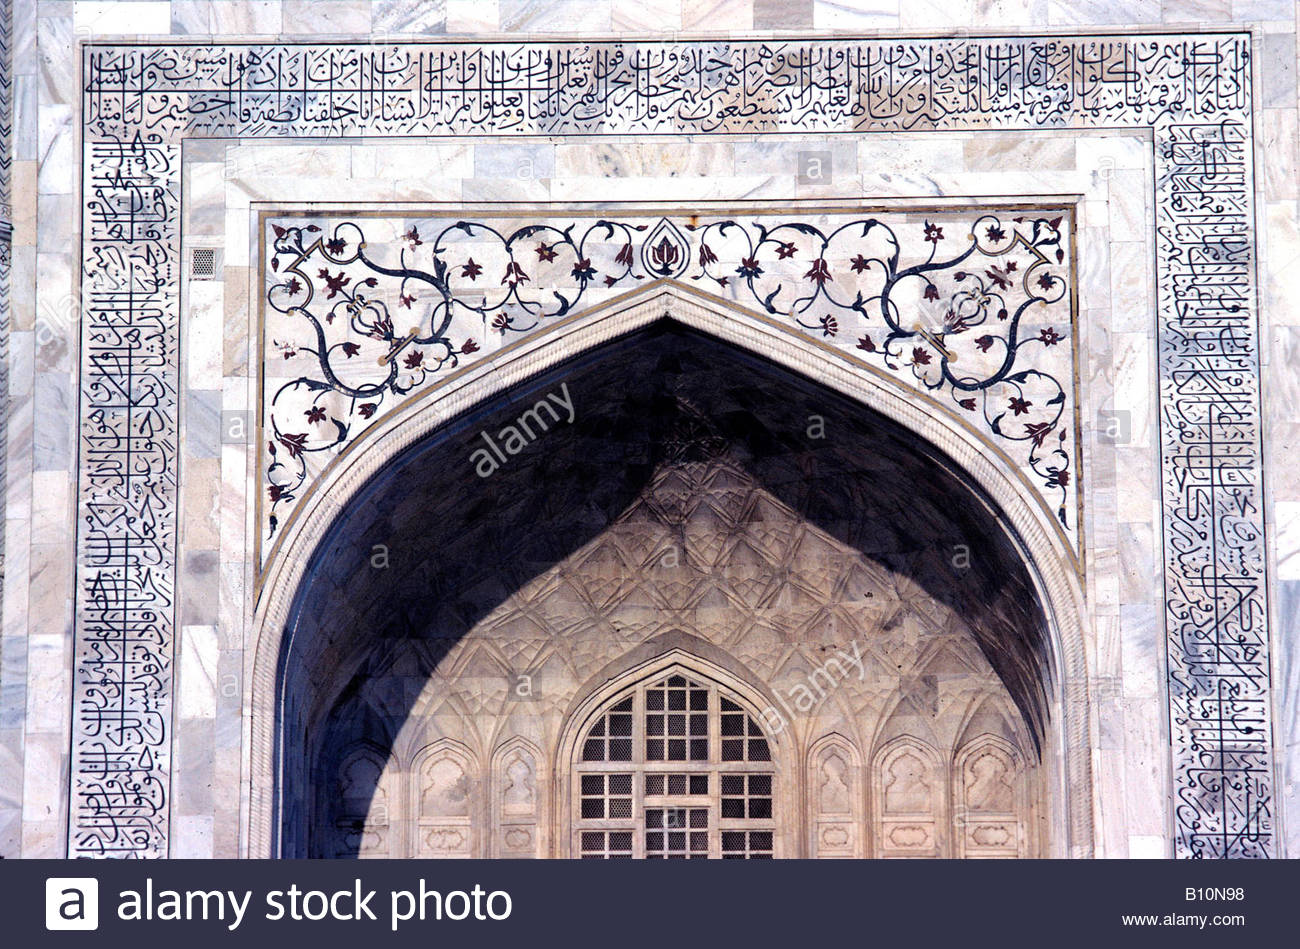 Taj Mahal Agra Shah Jahan period 1650 te Iwan showing decorative pattern dura in layl Copyright B Norman AAA Collection - Stock Image